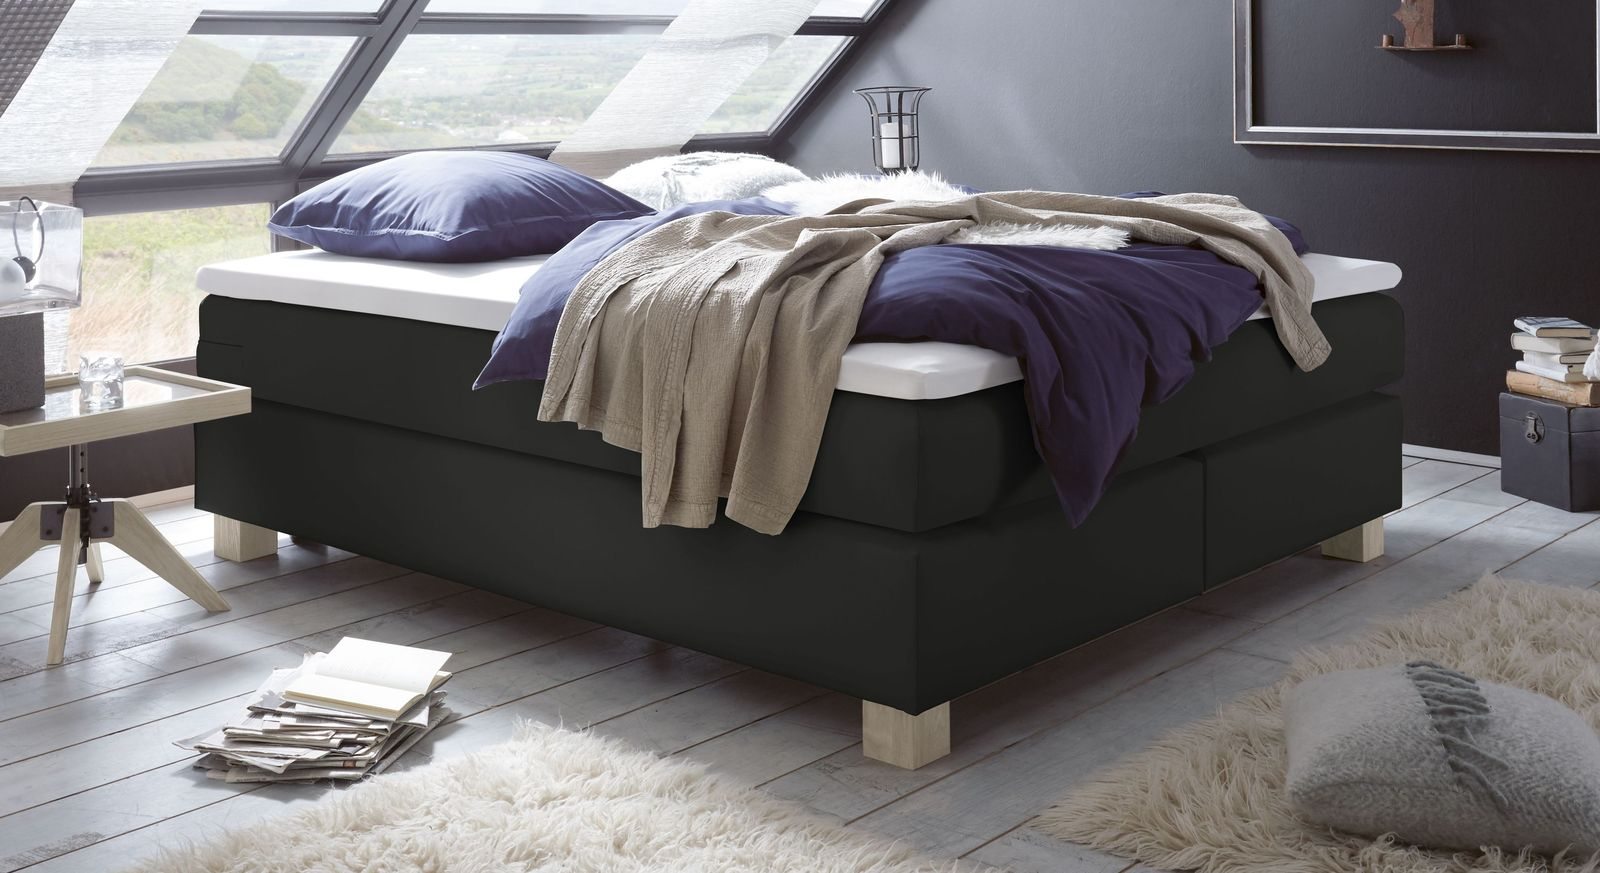 boxspringbett ohne kopfteil boxspringliege neu 09 2018. Black Bedroom Furniture Sets. Home Design Ideas